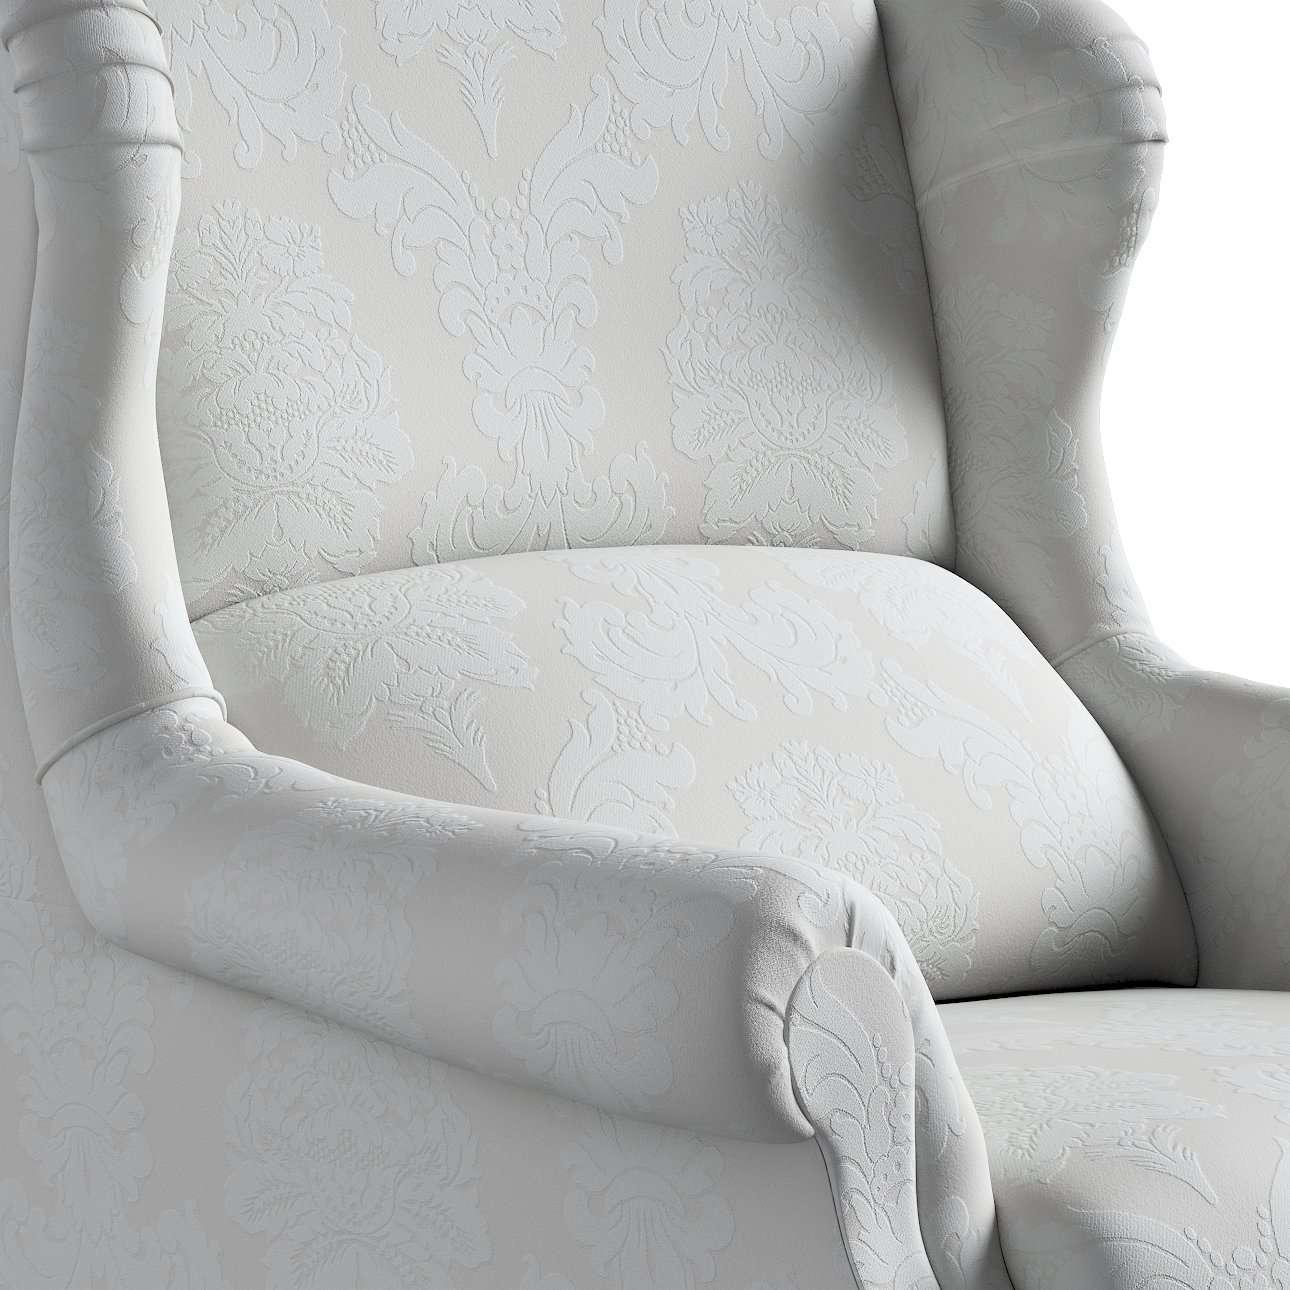 Fotel Unique w kolekcji Damasco, tkanina: 613-81